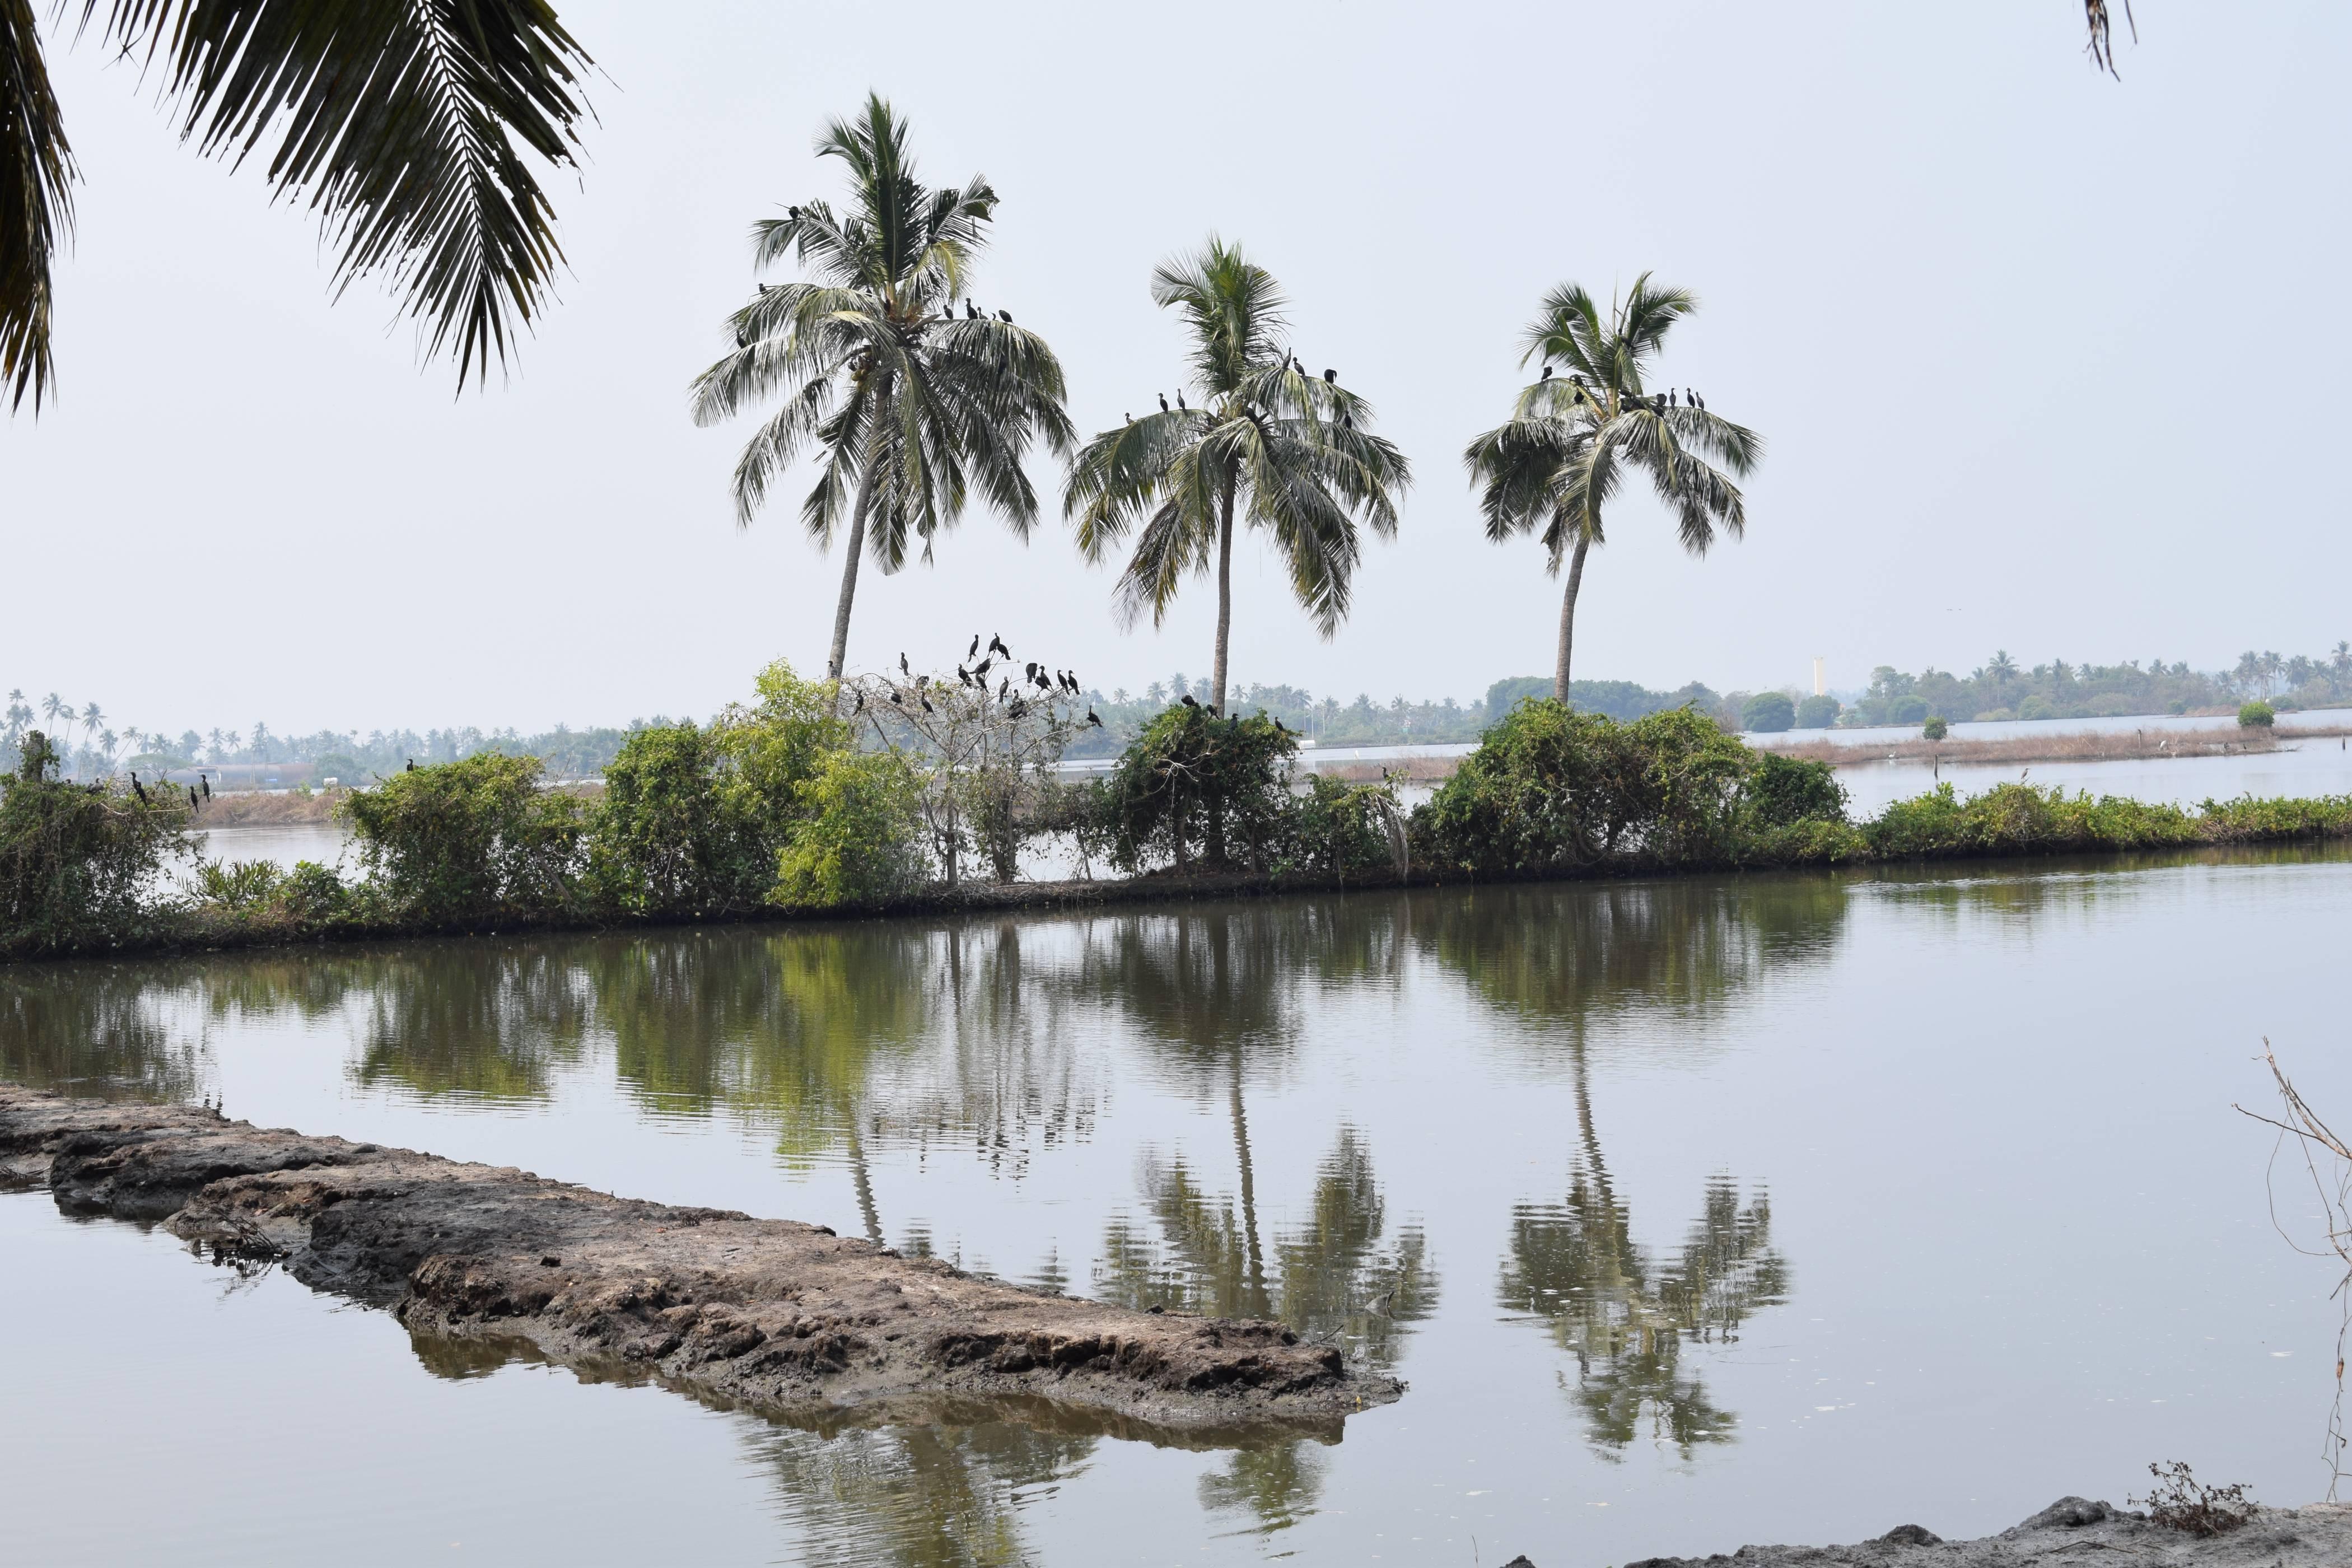 Kochi : Pokkali rice field